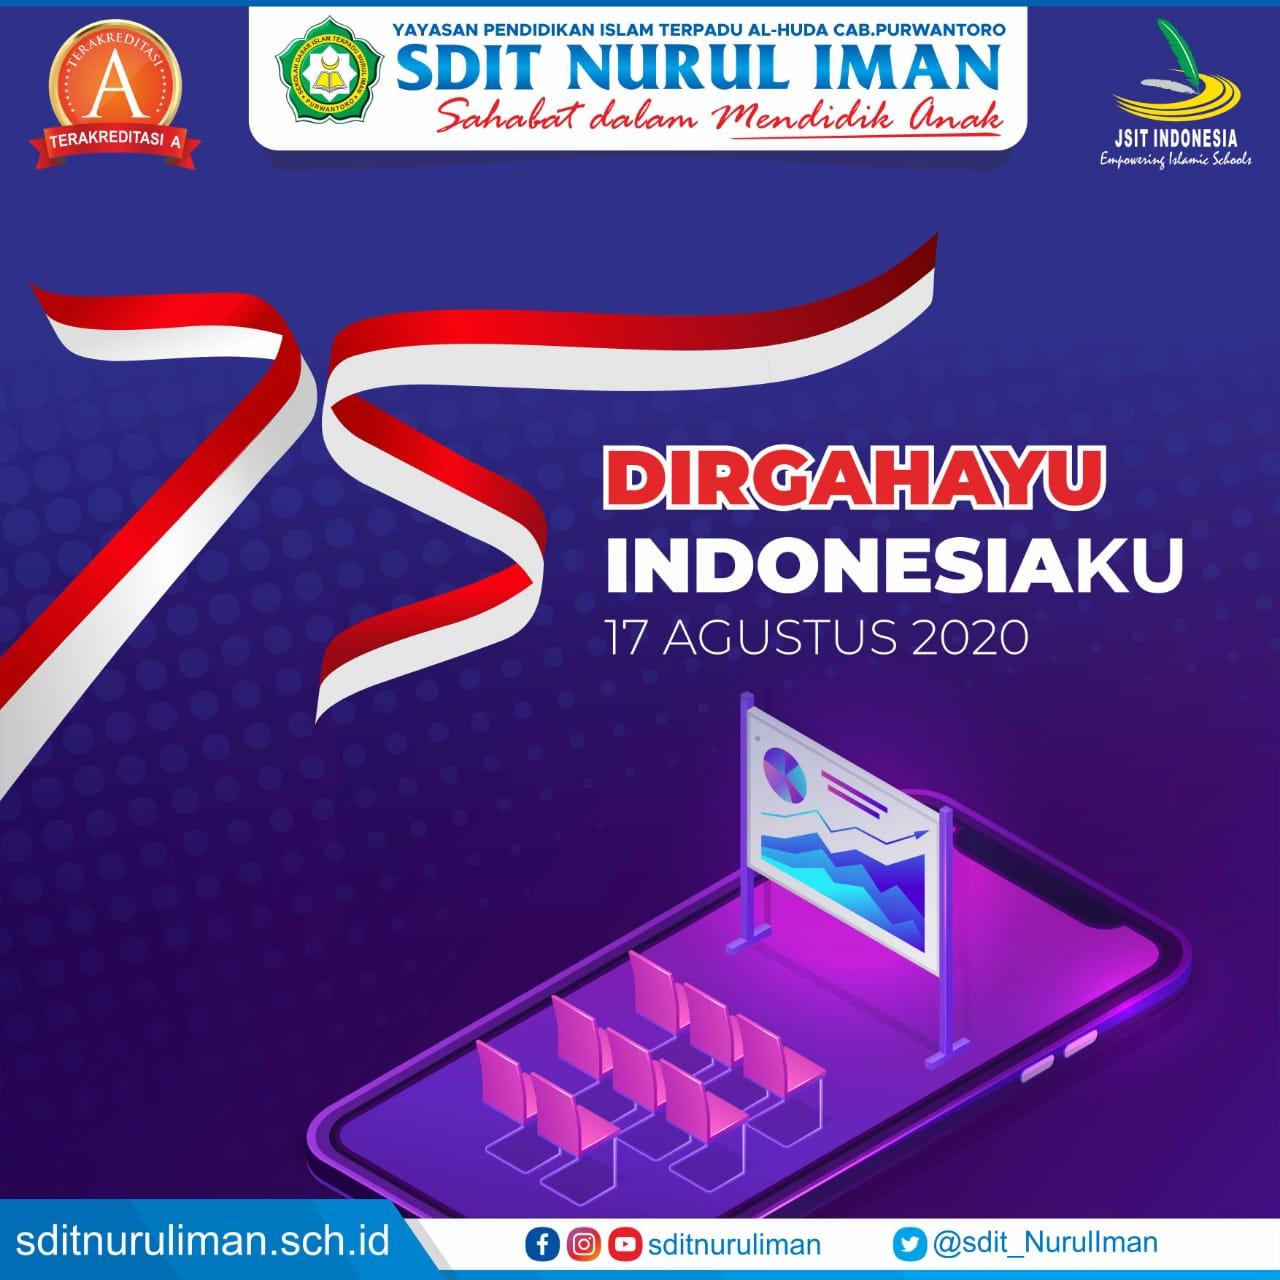 75th Dirgahayu Indonesiaku